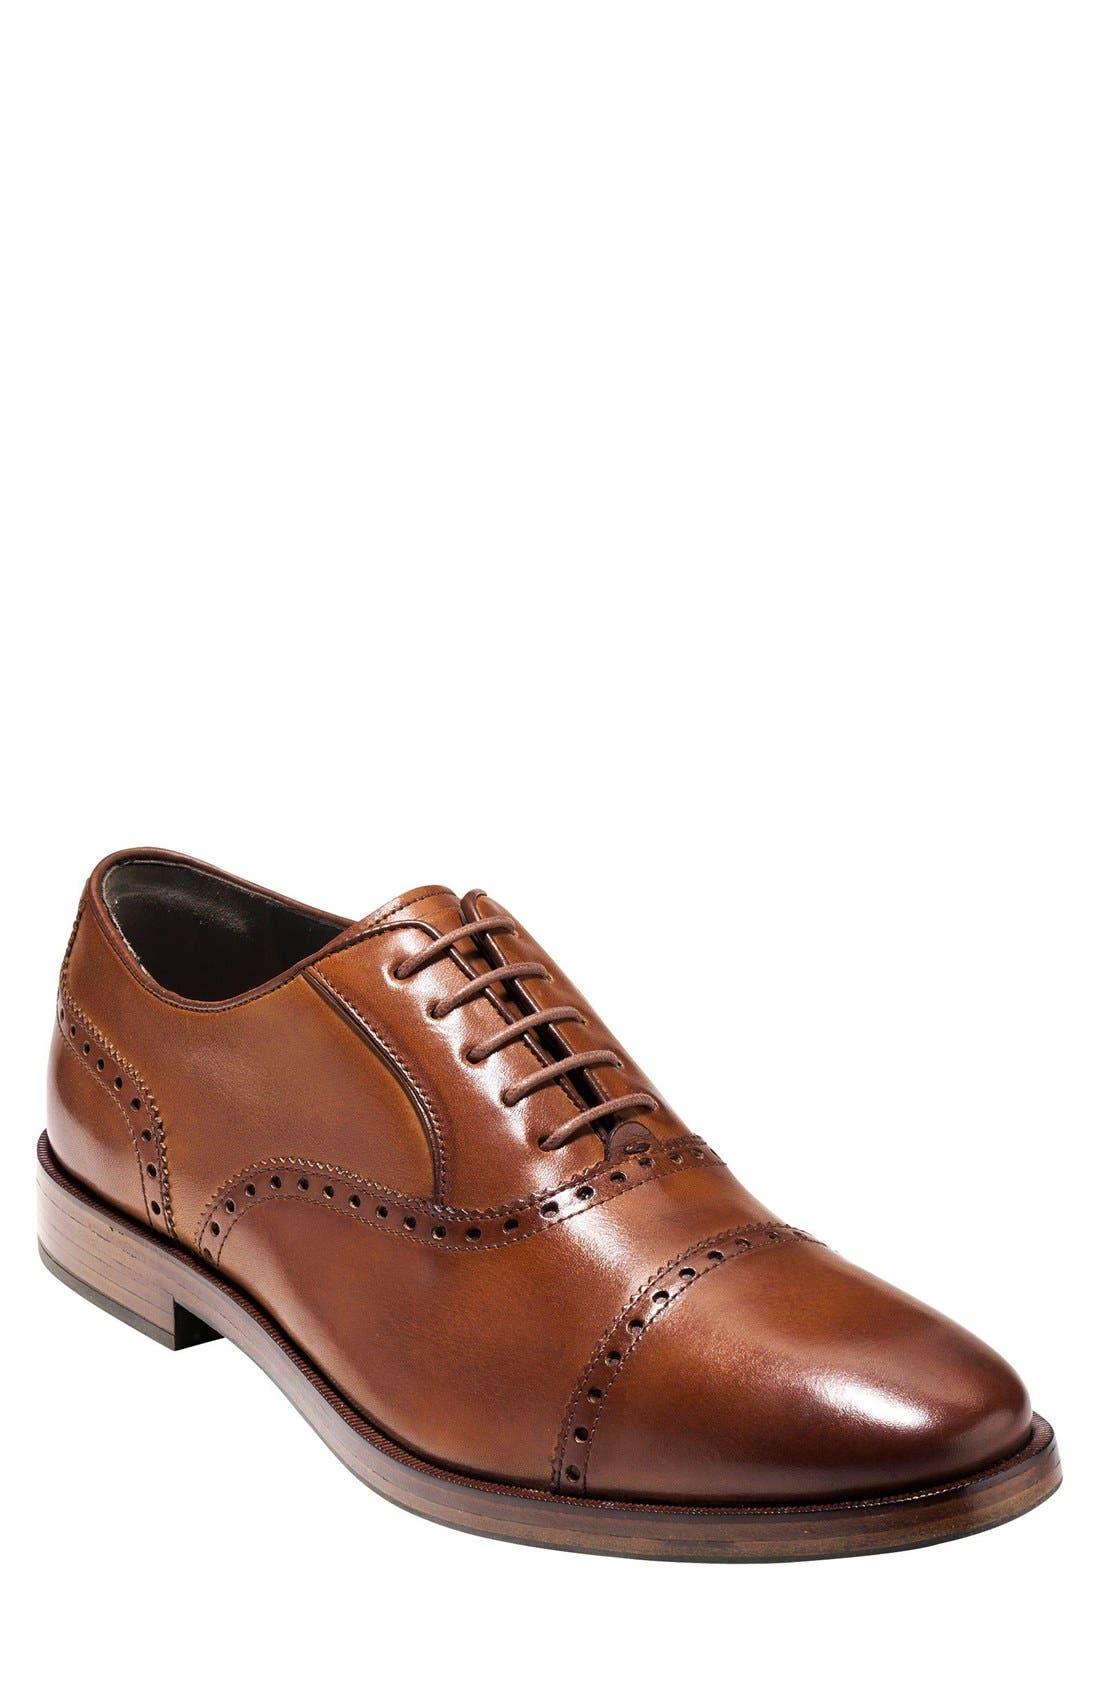 'Hamilton' Cap Toe Oxford,                         Main,                         color, British Tan Leather